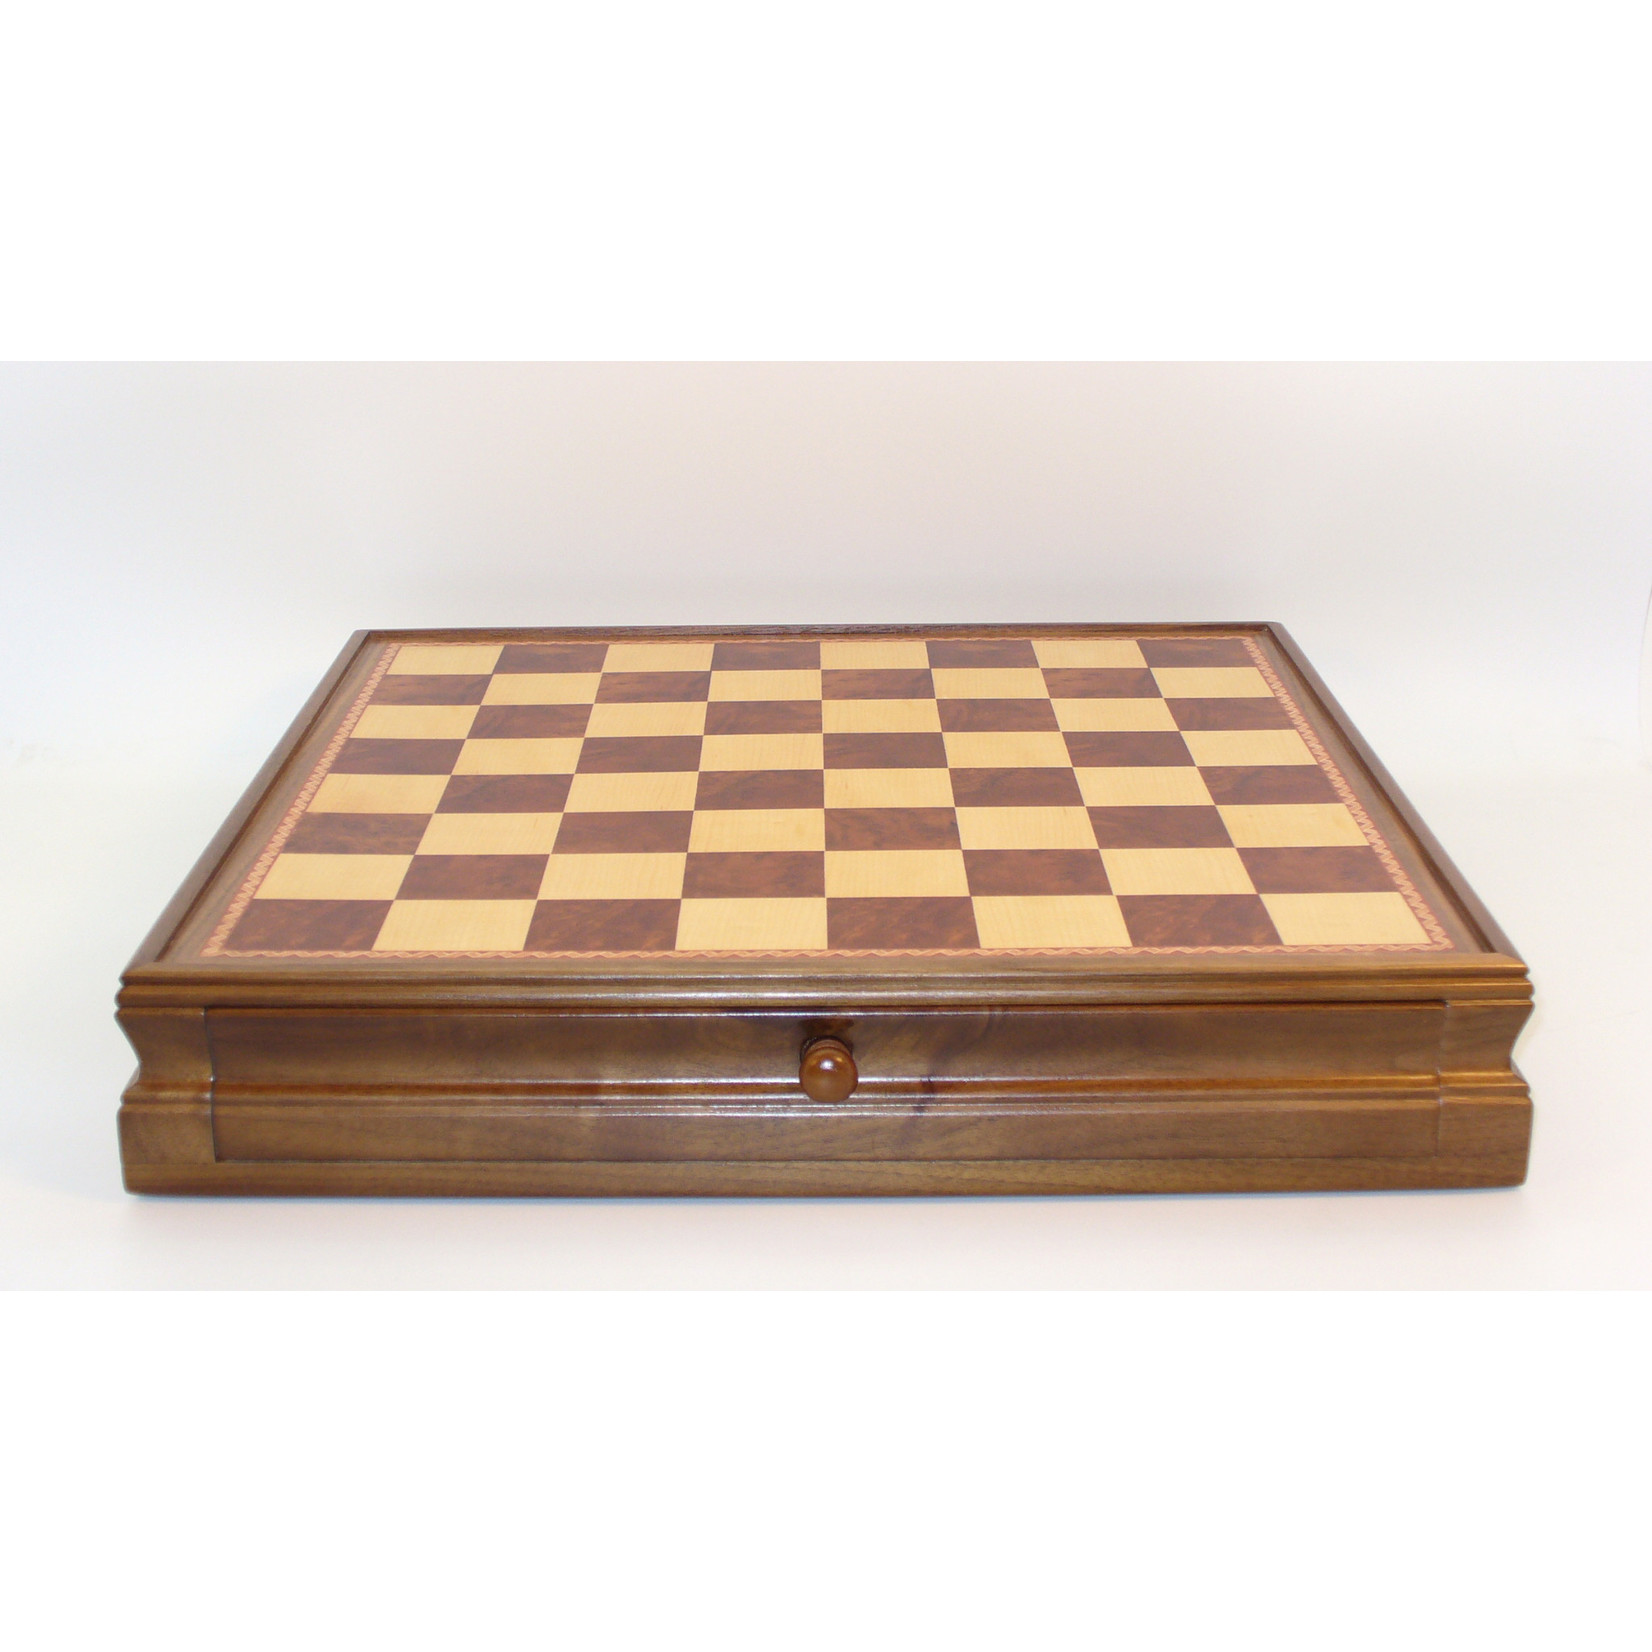 "WorldWise Imports Chess: 15"" Walnut Maple Chest w/ drawer"